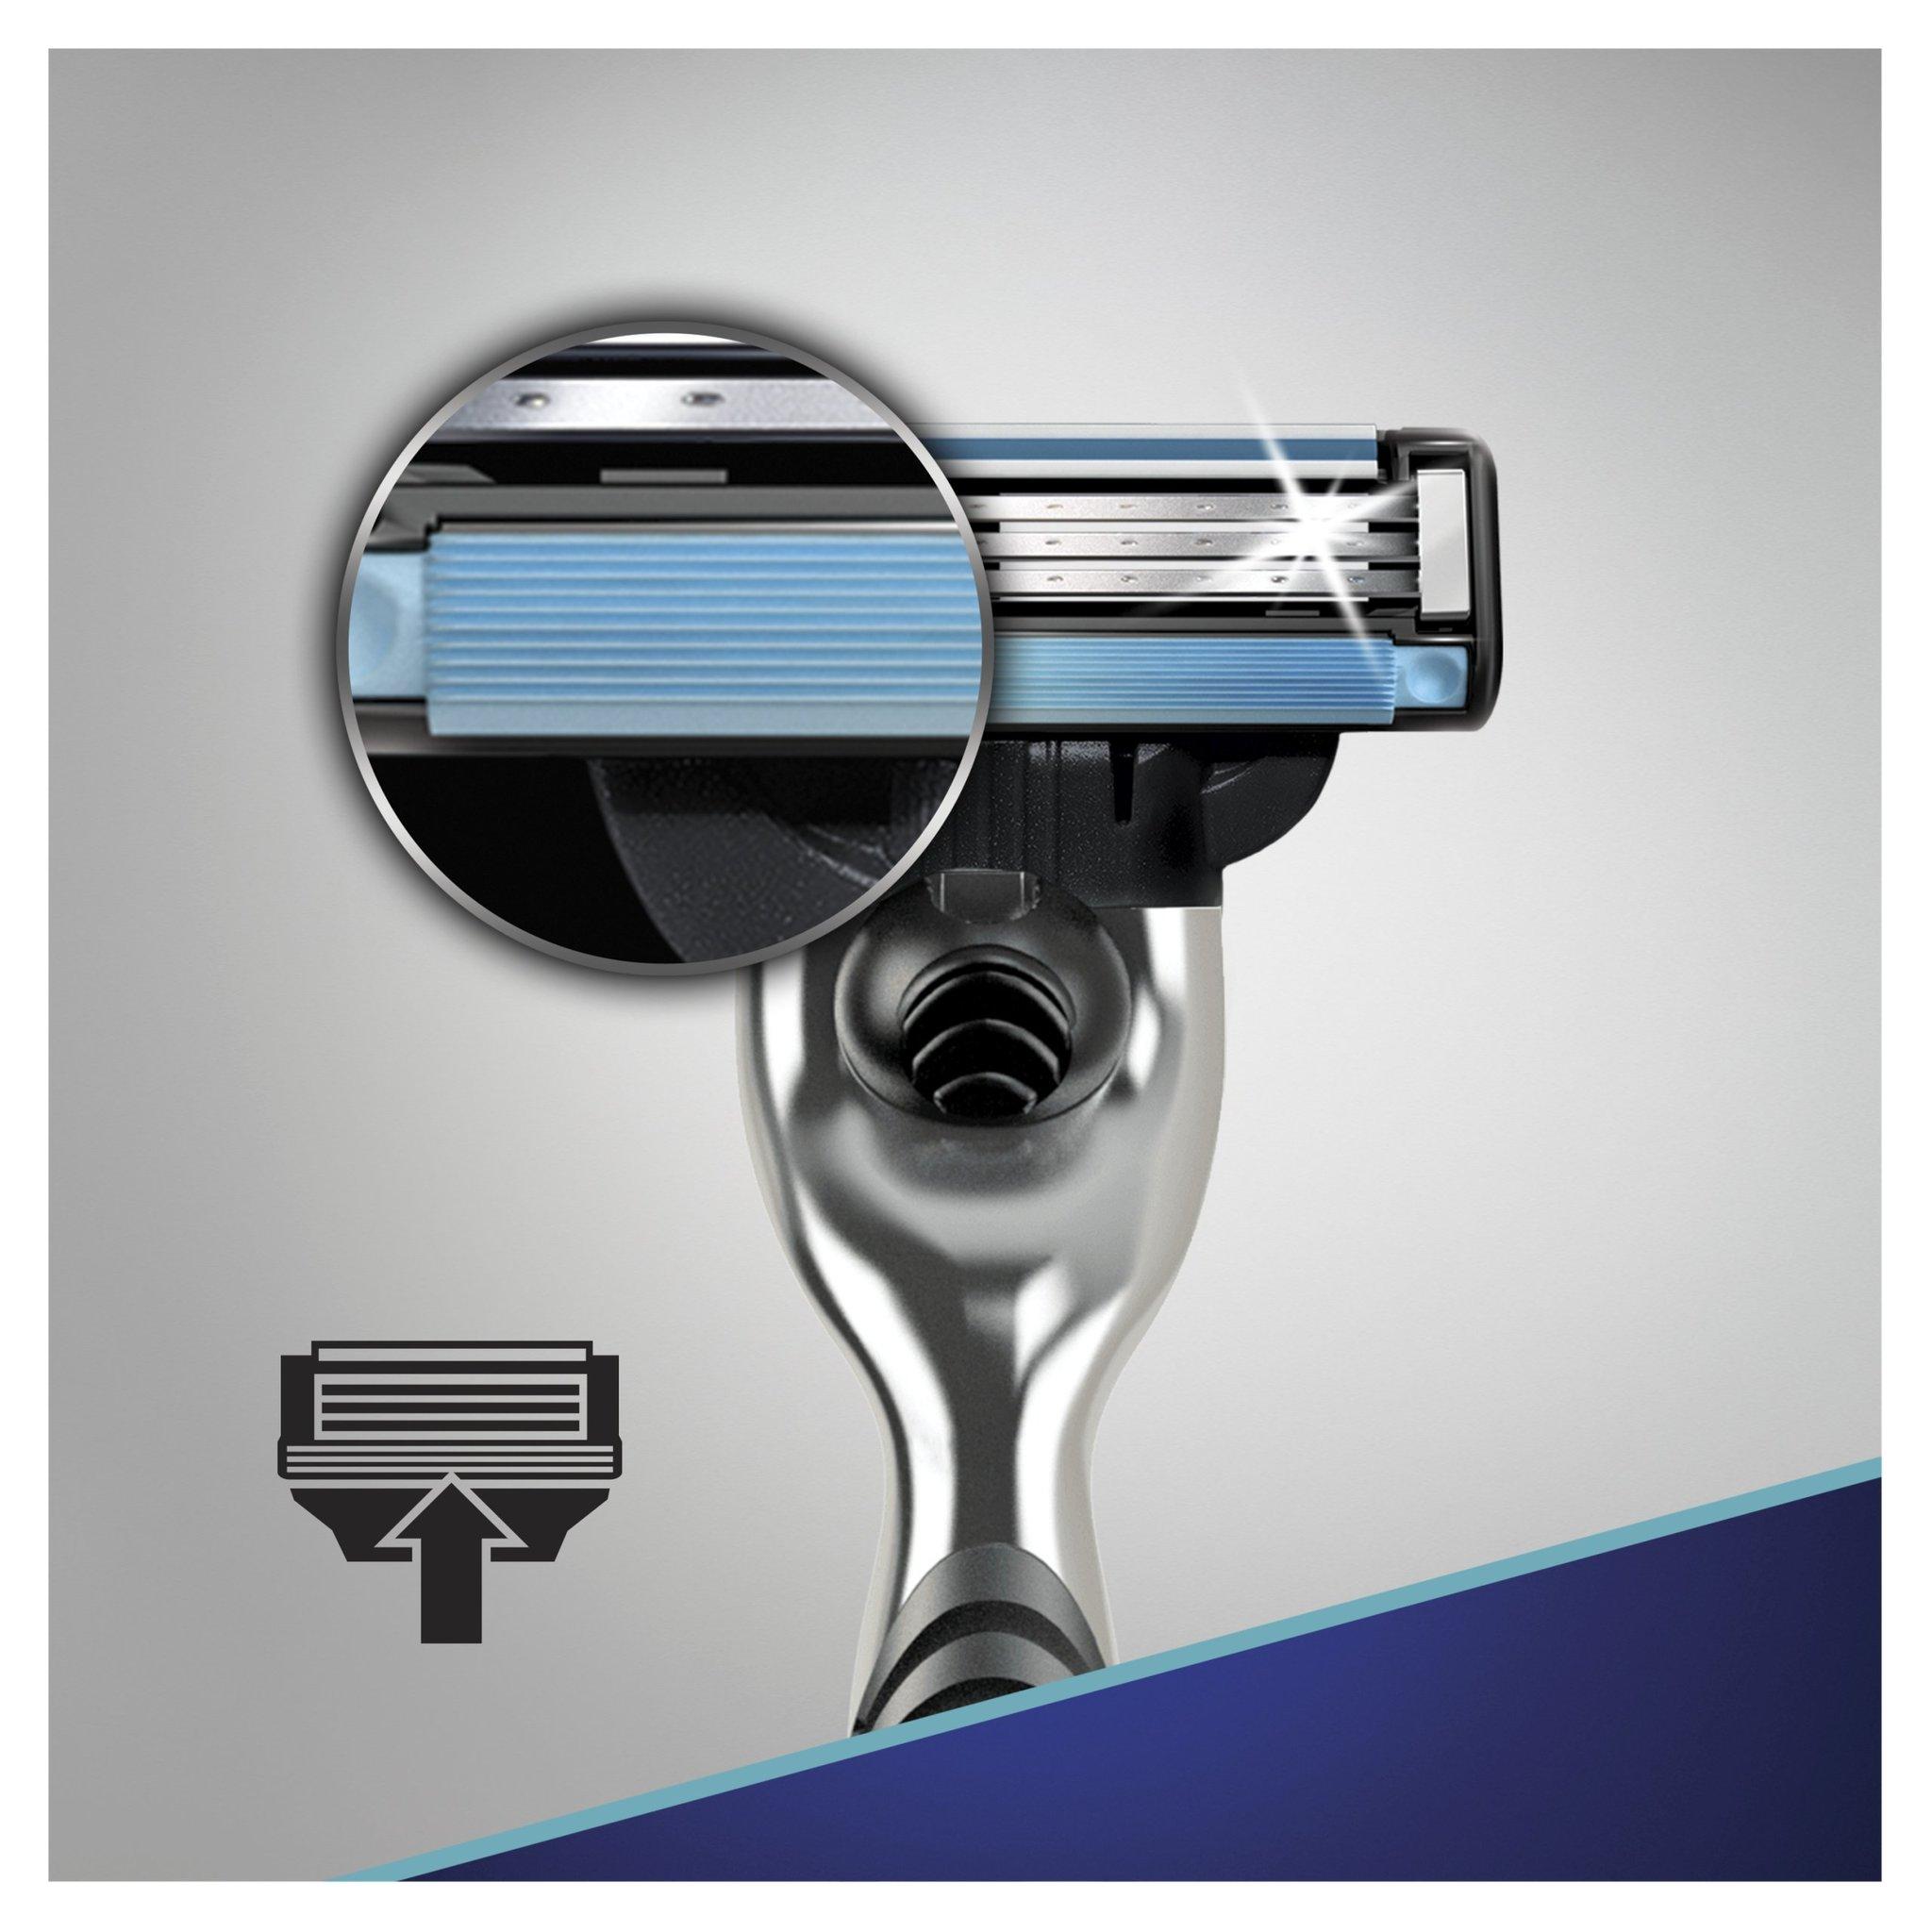 Кассеты для бритья Gillette mach3 8 шт